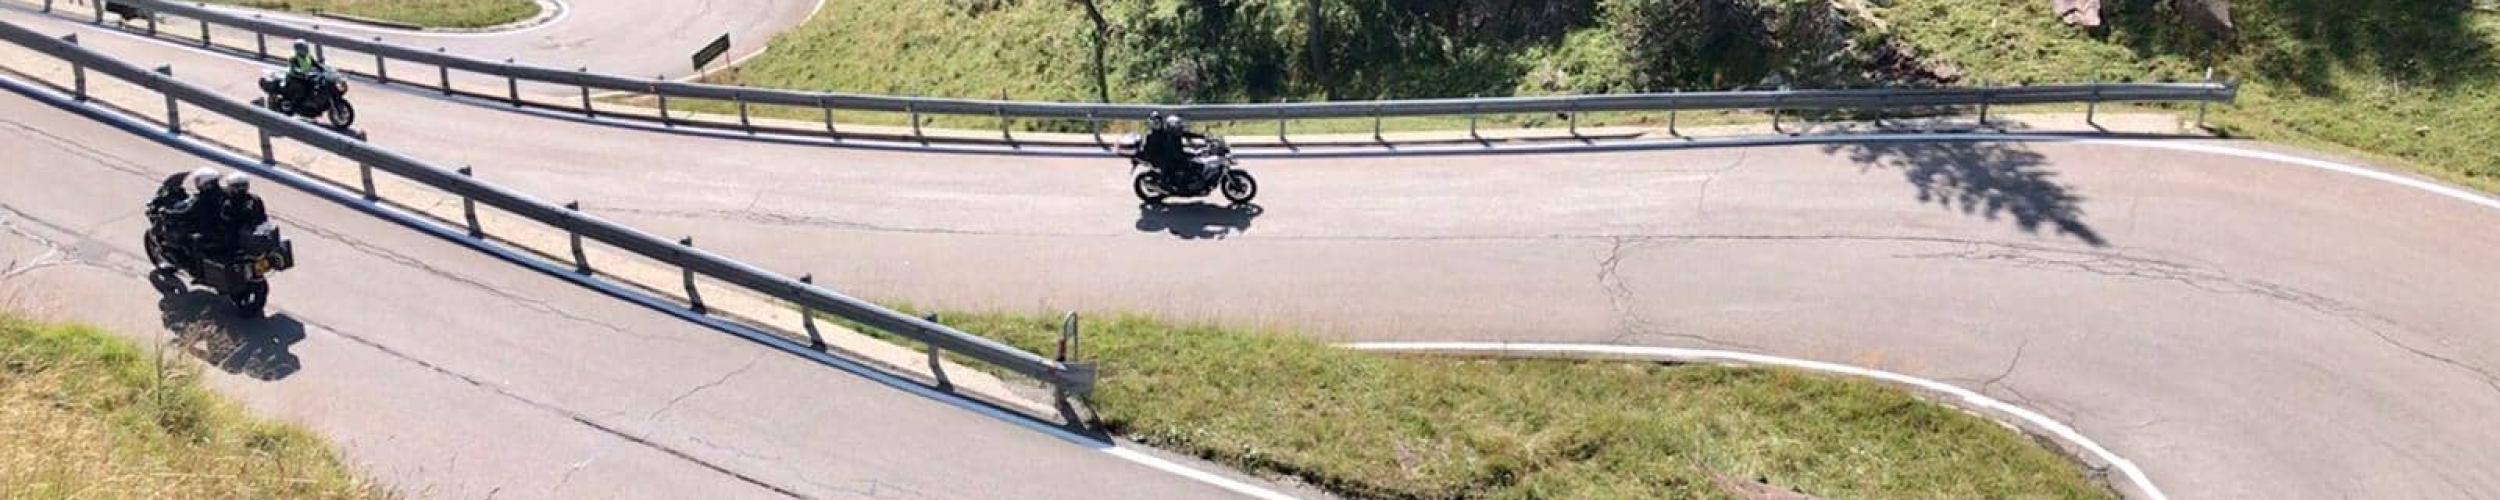 Motorvakantie in de Dolomieten - Lago di Levico | Motorreizen Italië